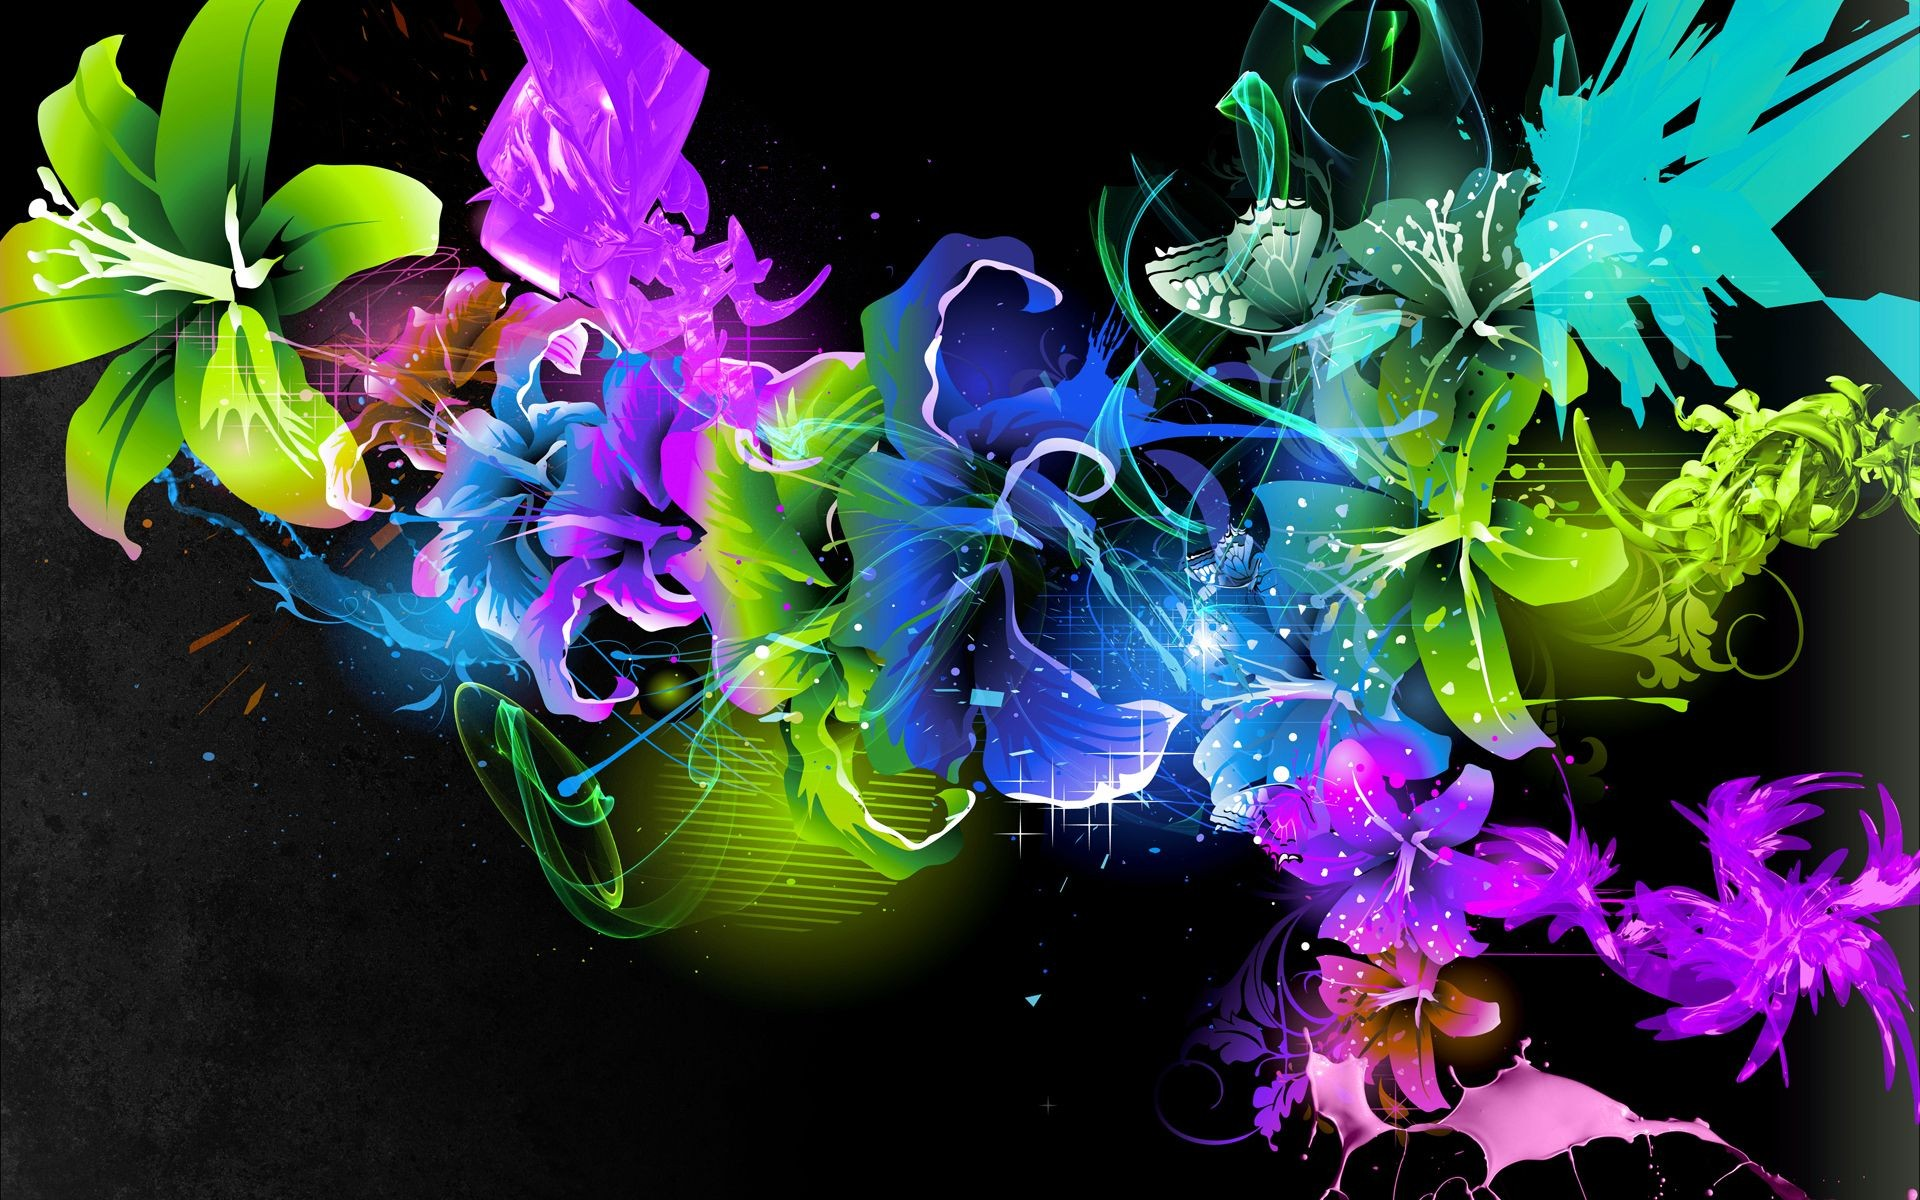 Color Abstract Wallpaper HD Wallpaper 1920x1200